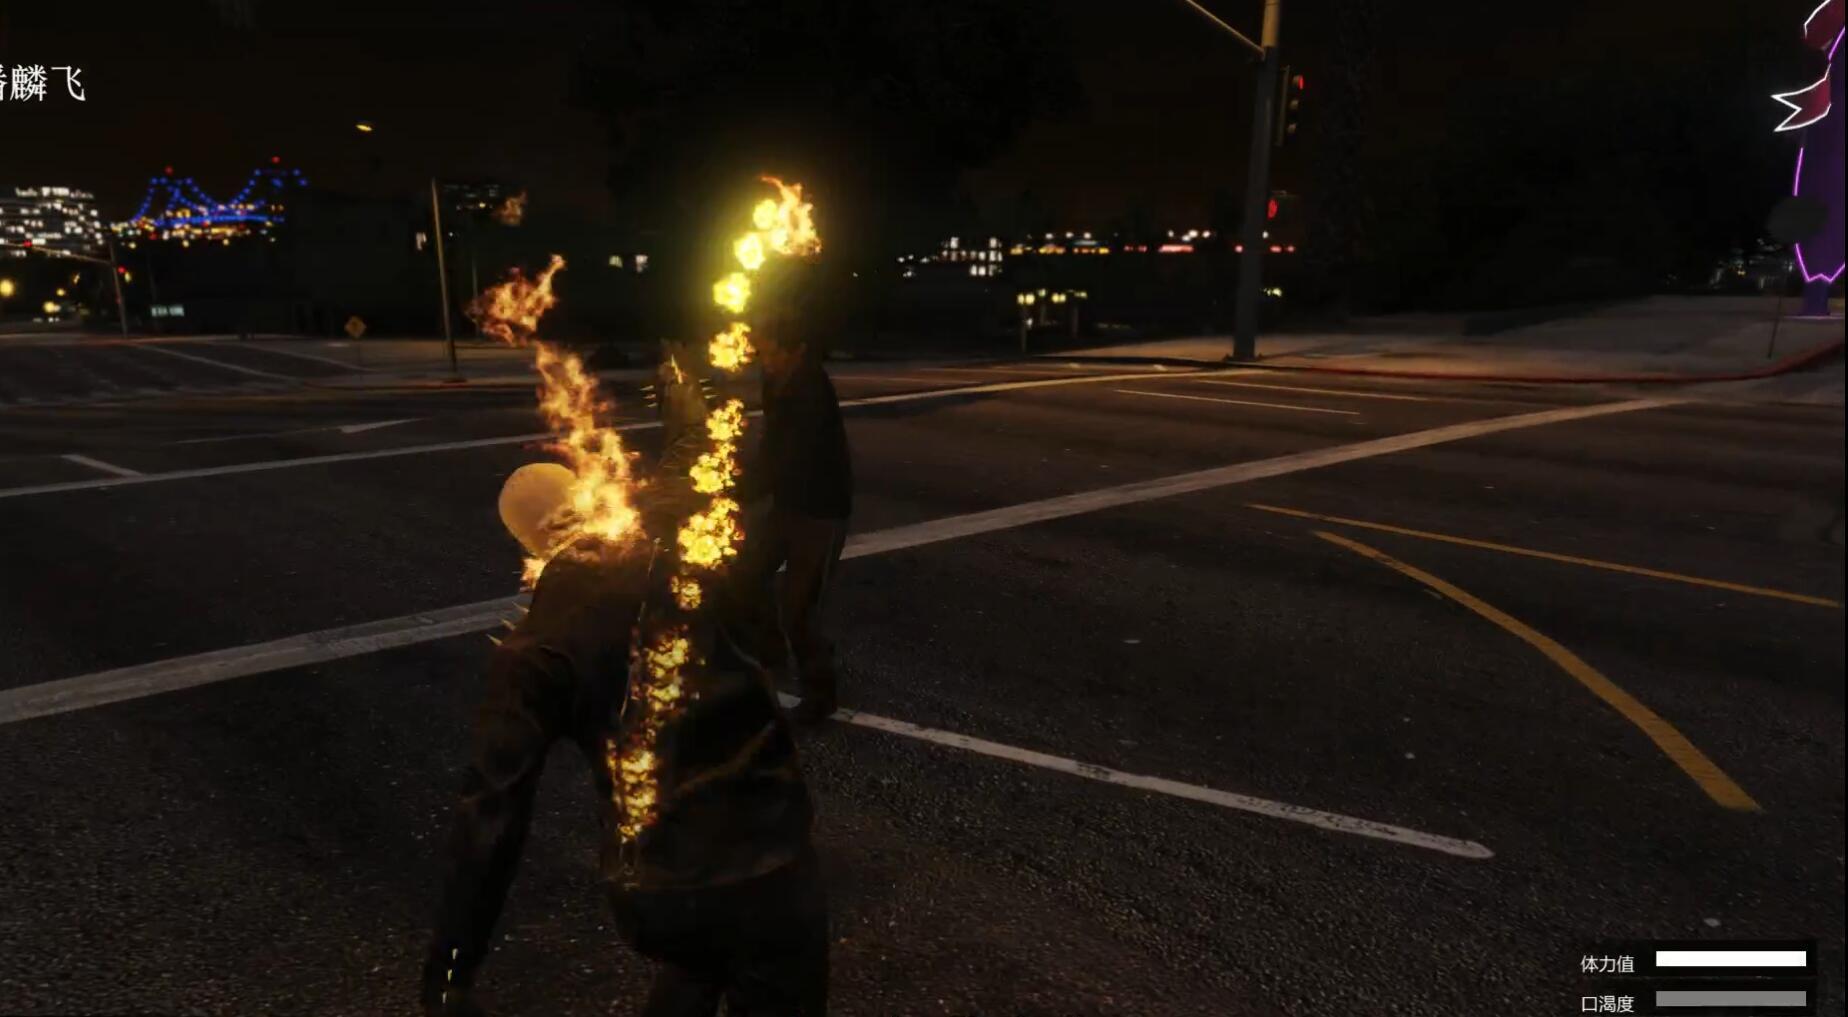 《GTA5》游戏里以恶灵骑士辅助mod实现各种带火焰的效果